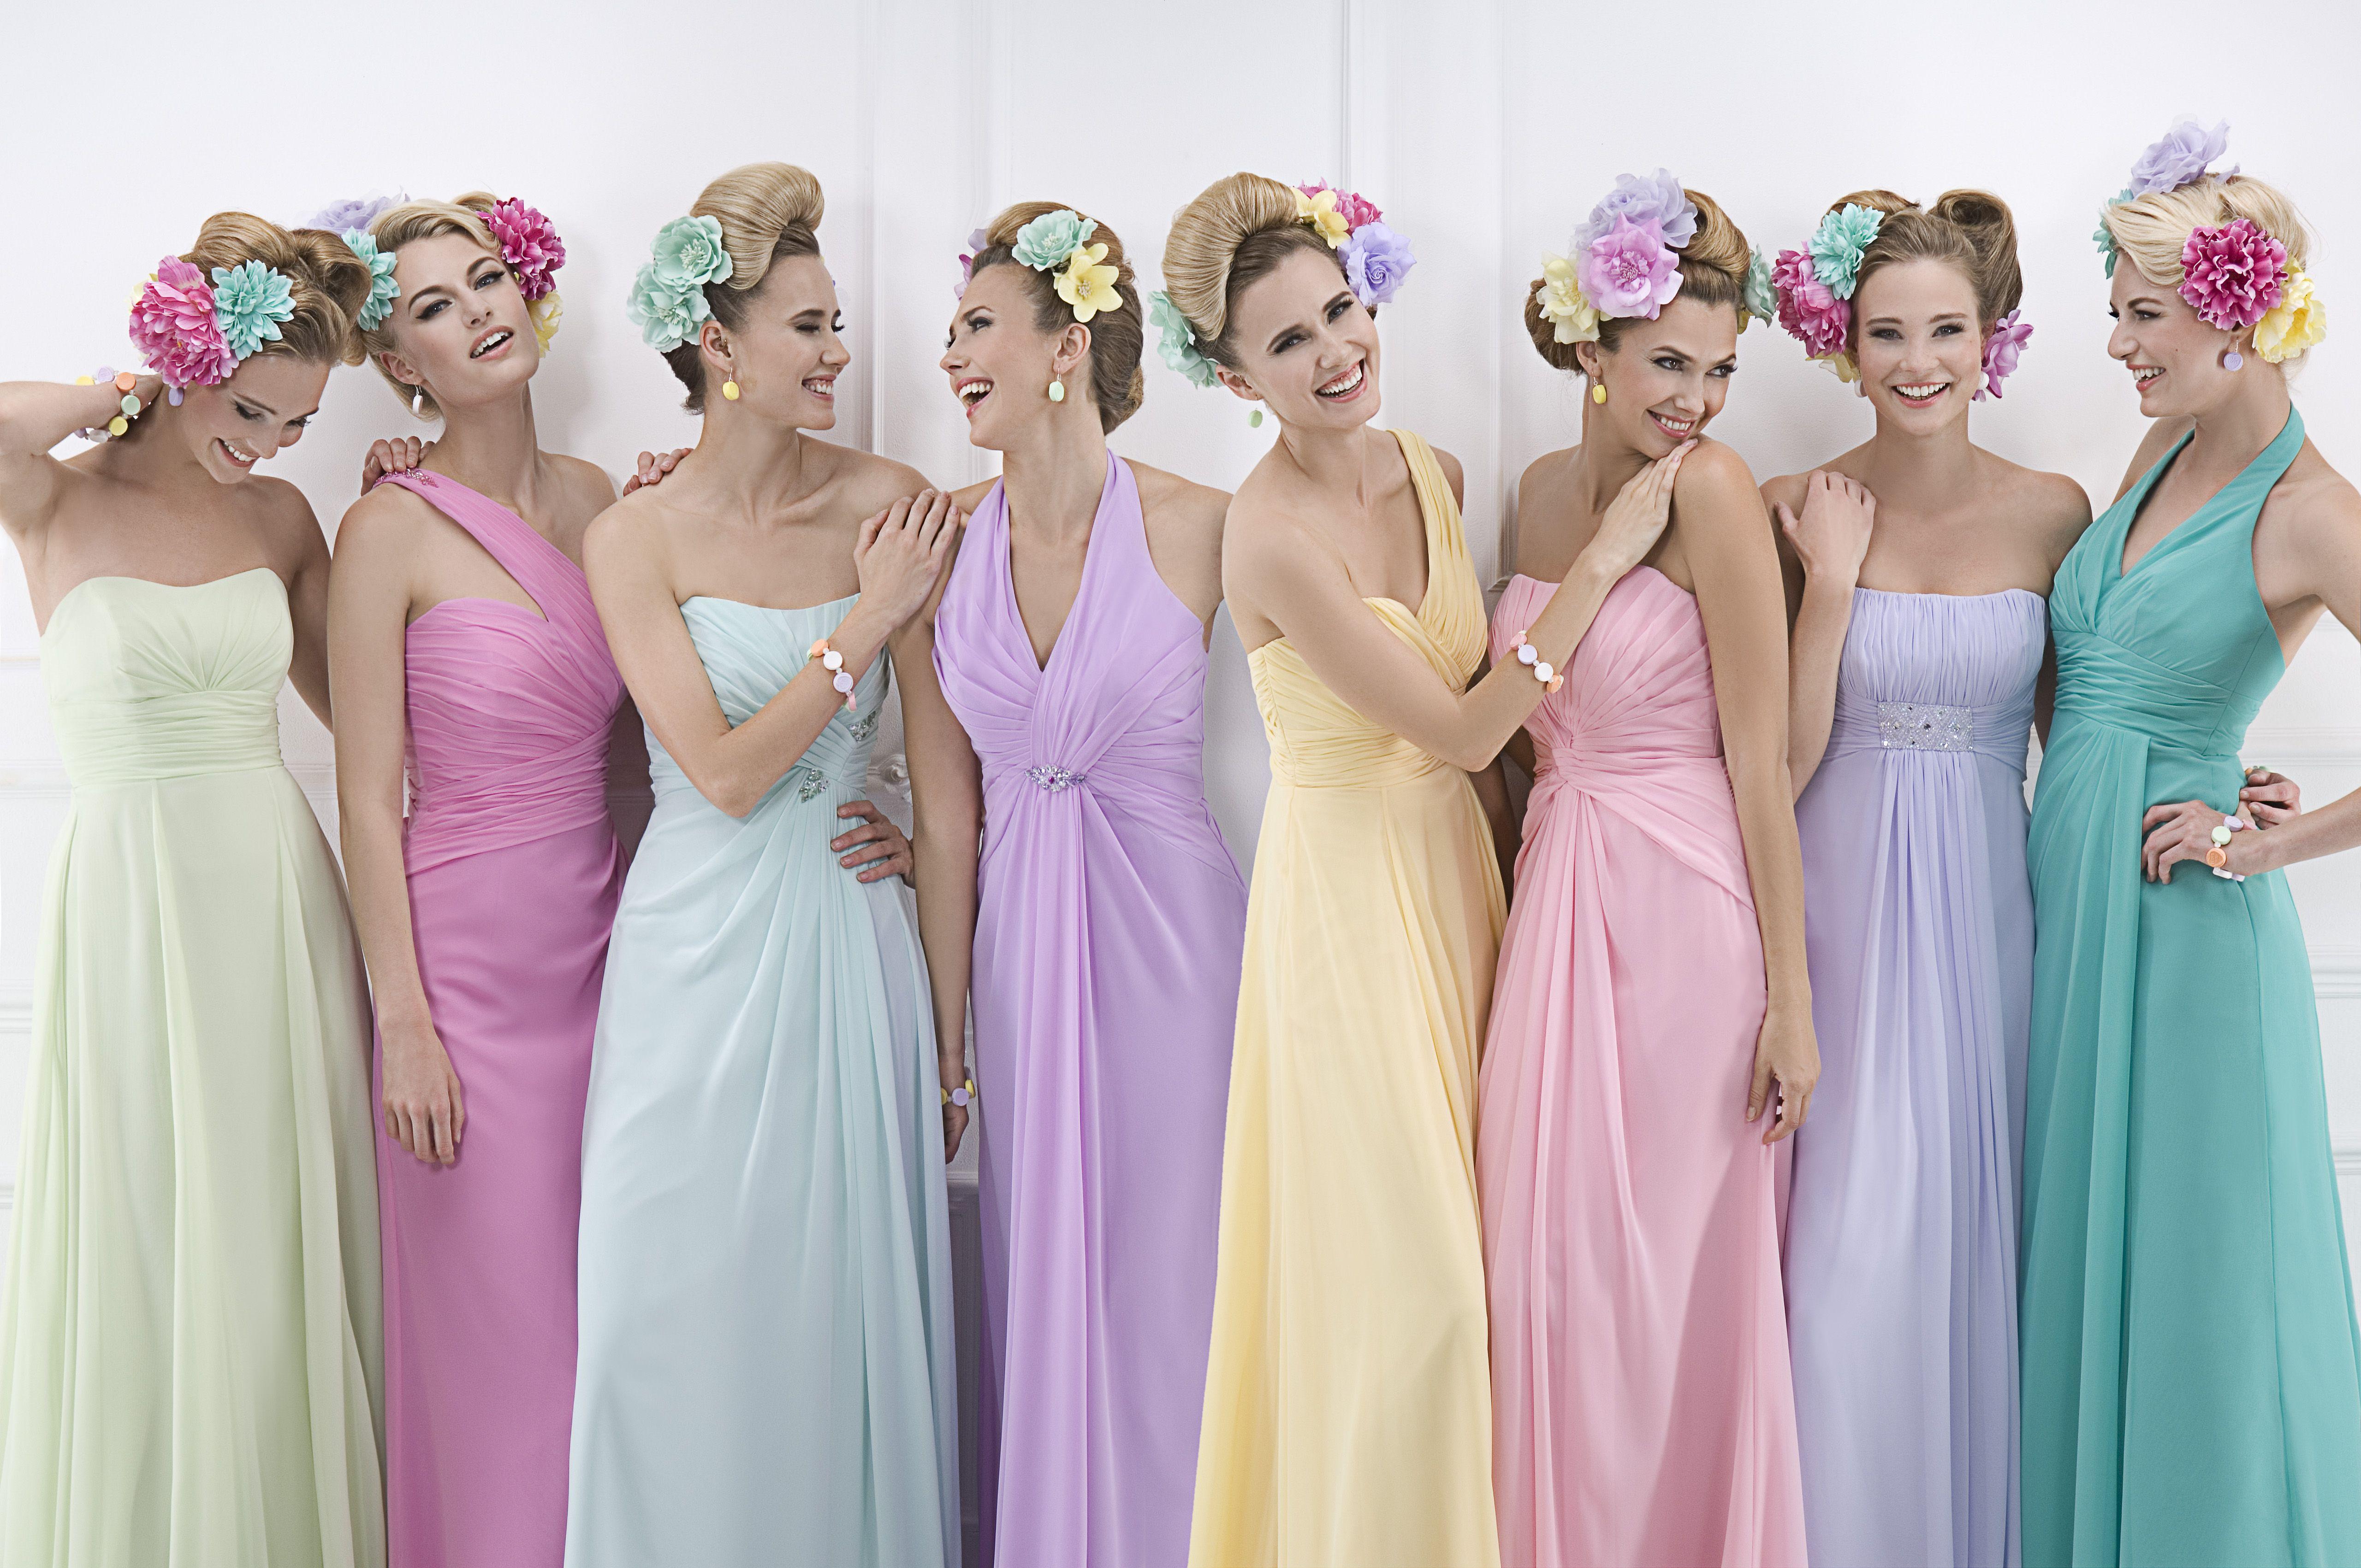 b4c6792ab2f6 Fotografi matrimonio Campania. Abiti damigelle adulte in colore Hemlock by  Pantone. Colori moda wedding 2014